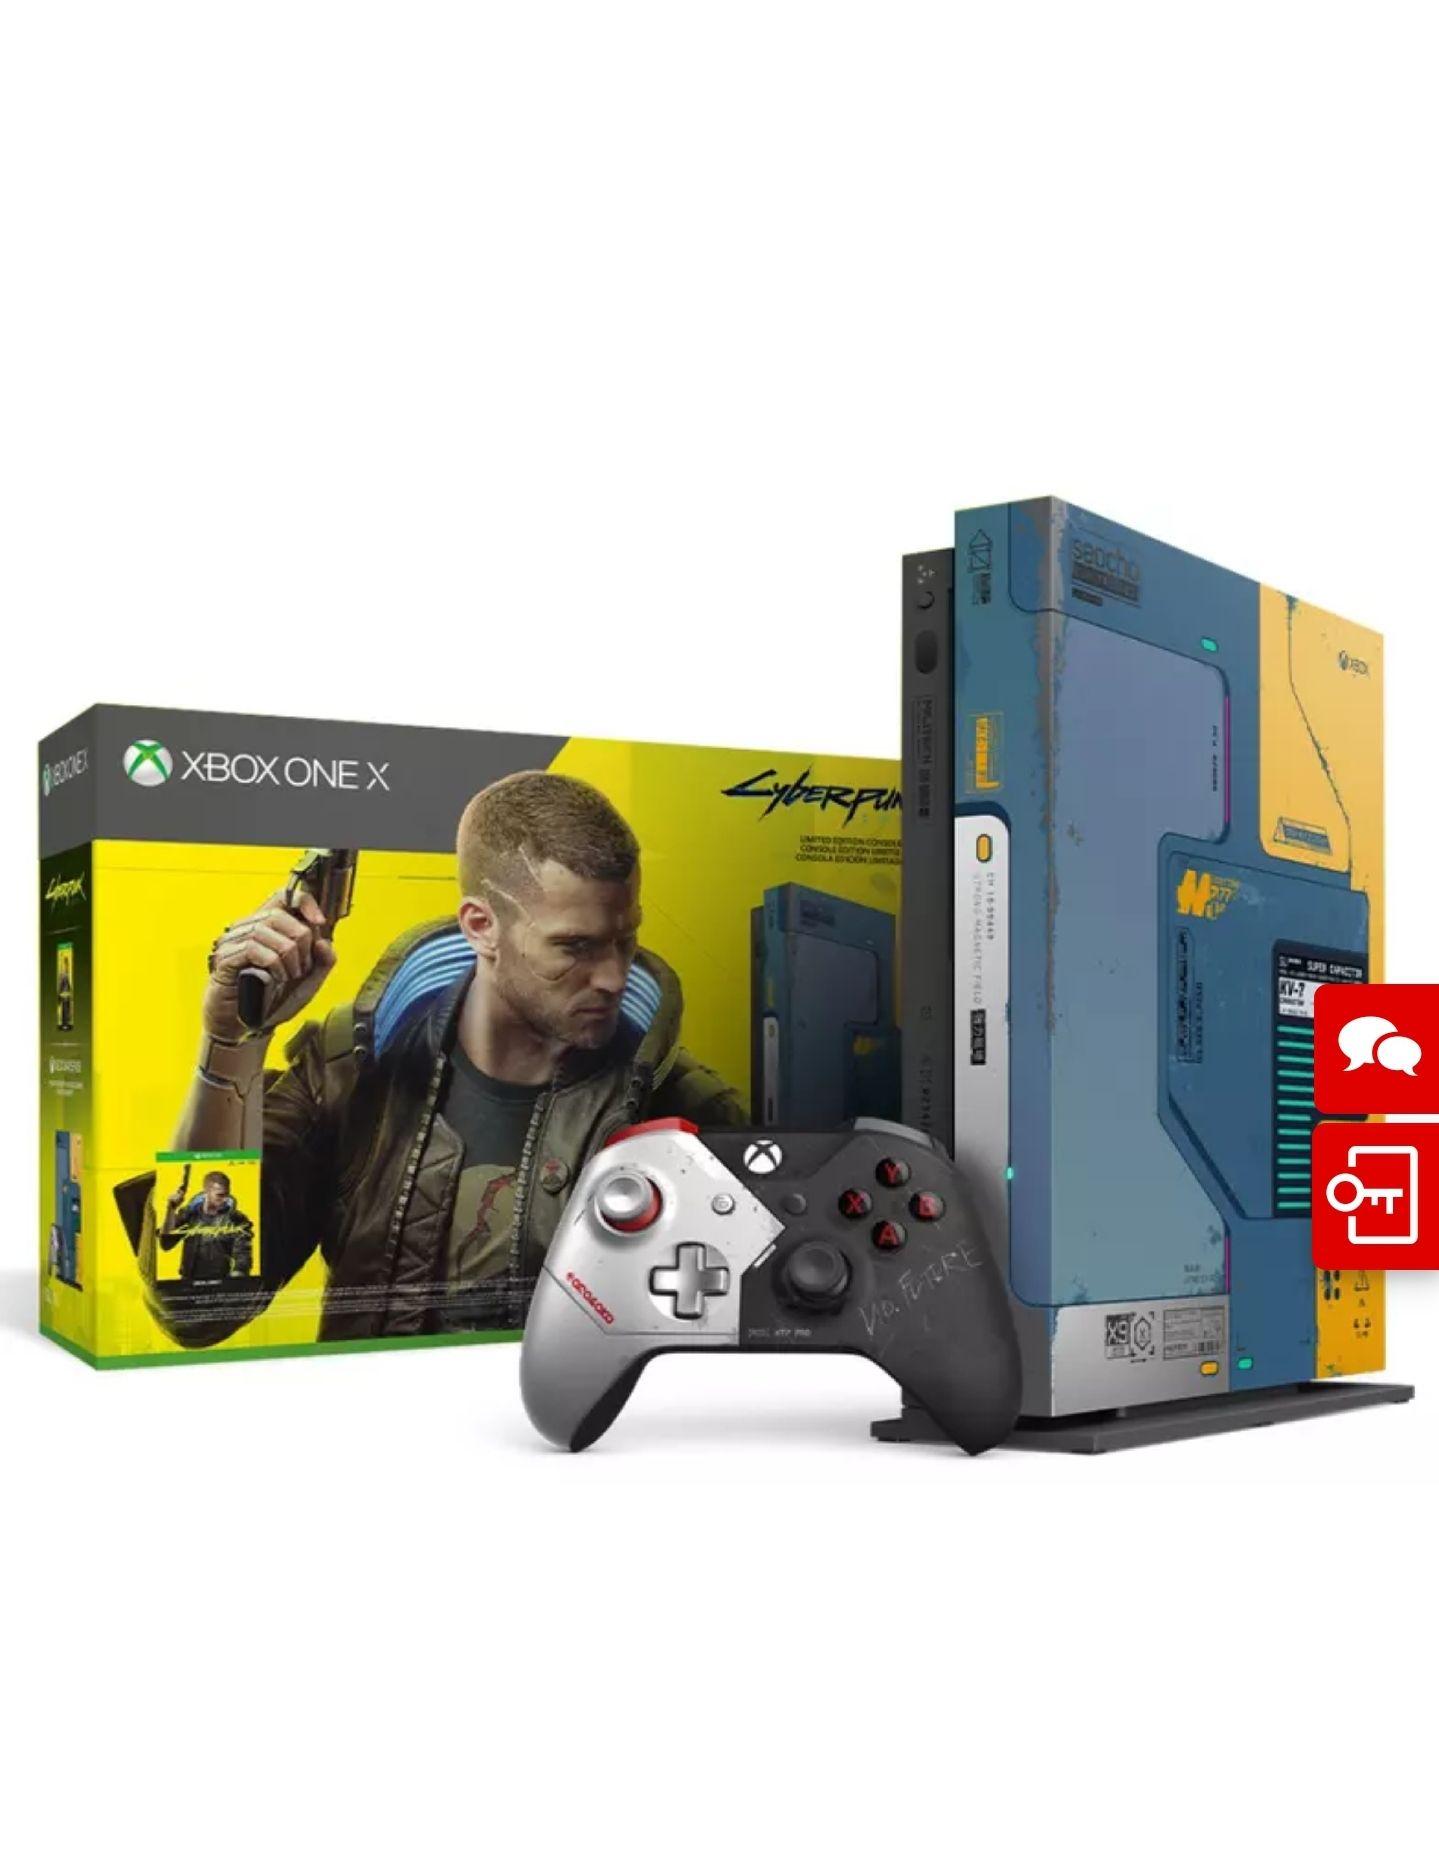 Xbox One X 1TB Cyberpunk 2077 (Ed. Limitada) Reacondicionada